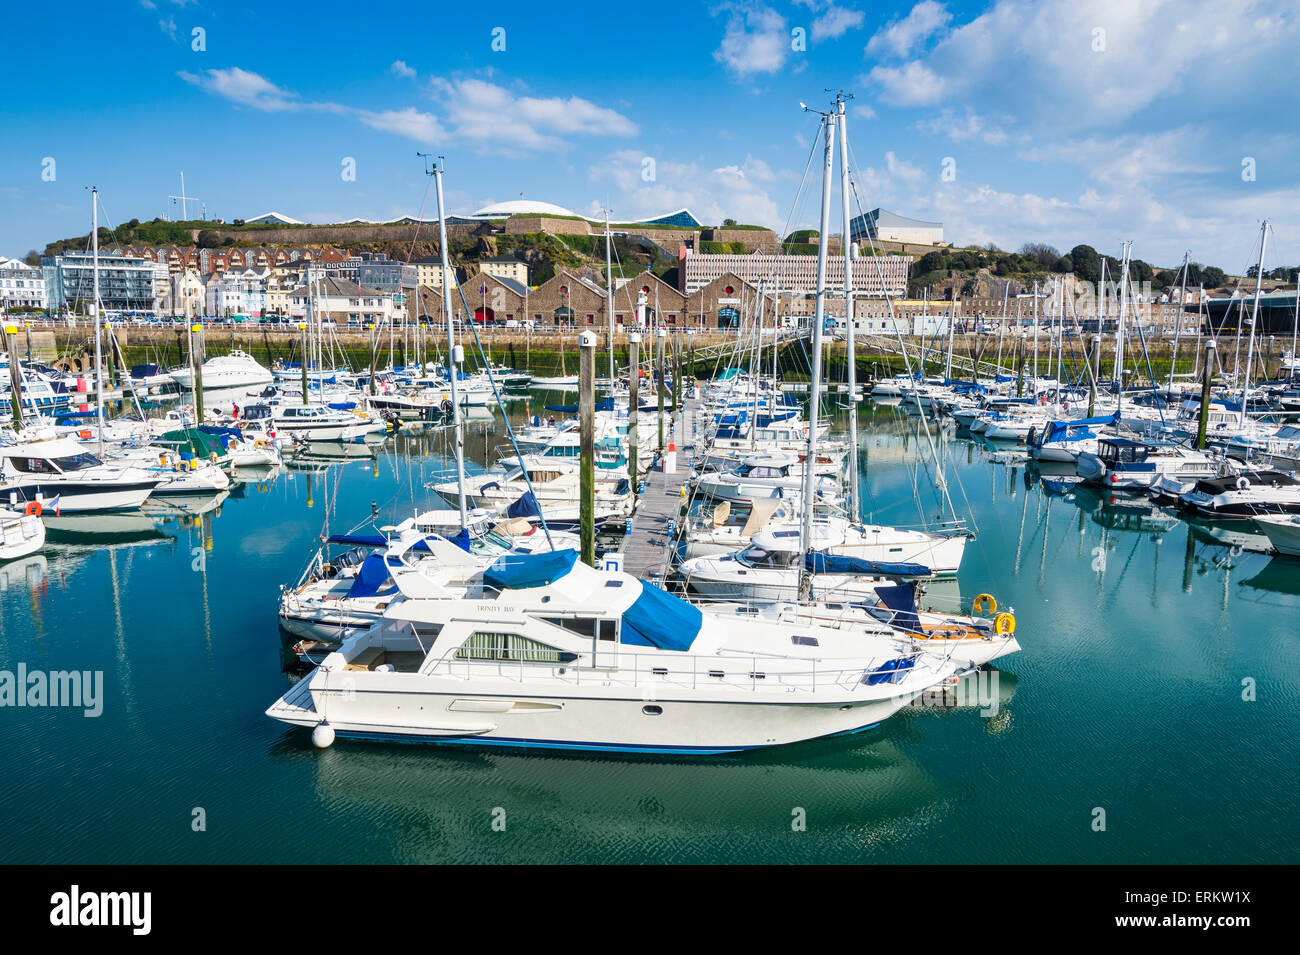 Sport boat harbour, St. Helier, Jersey, Channel Islands, United Kingdom, Europe - Stock Image